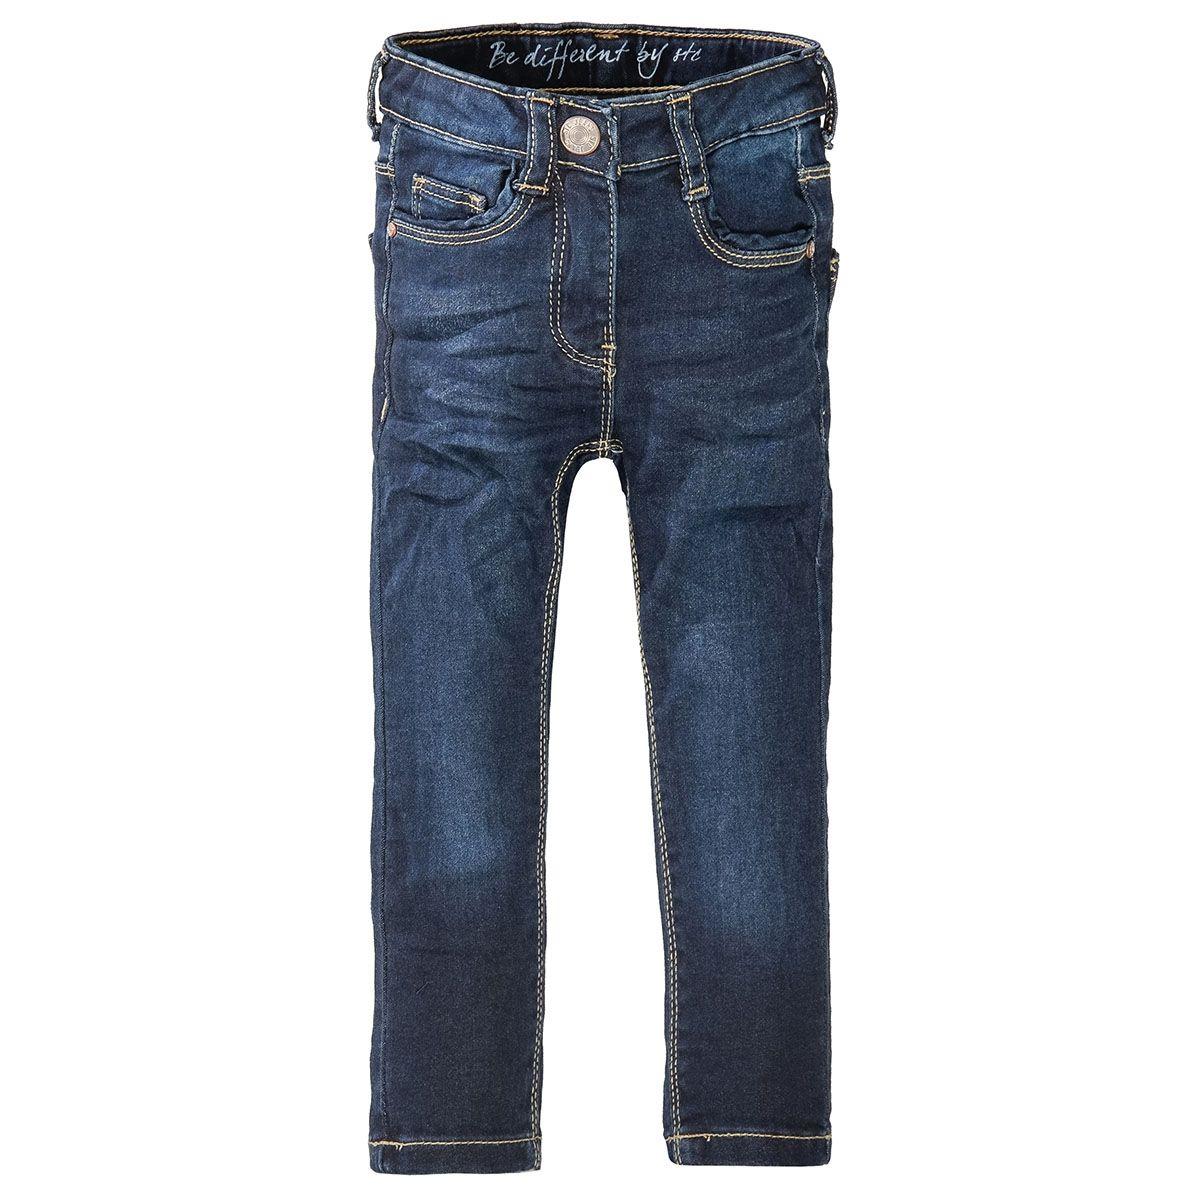 Mädchen Skinny Jeans Slim Fit - Dark Blue Denim